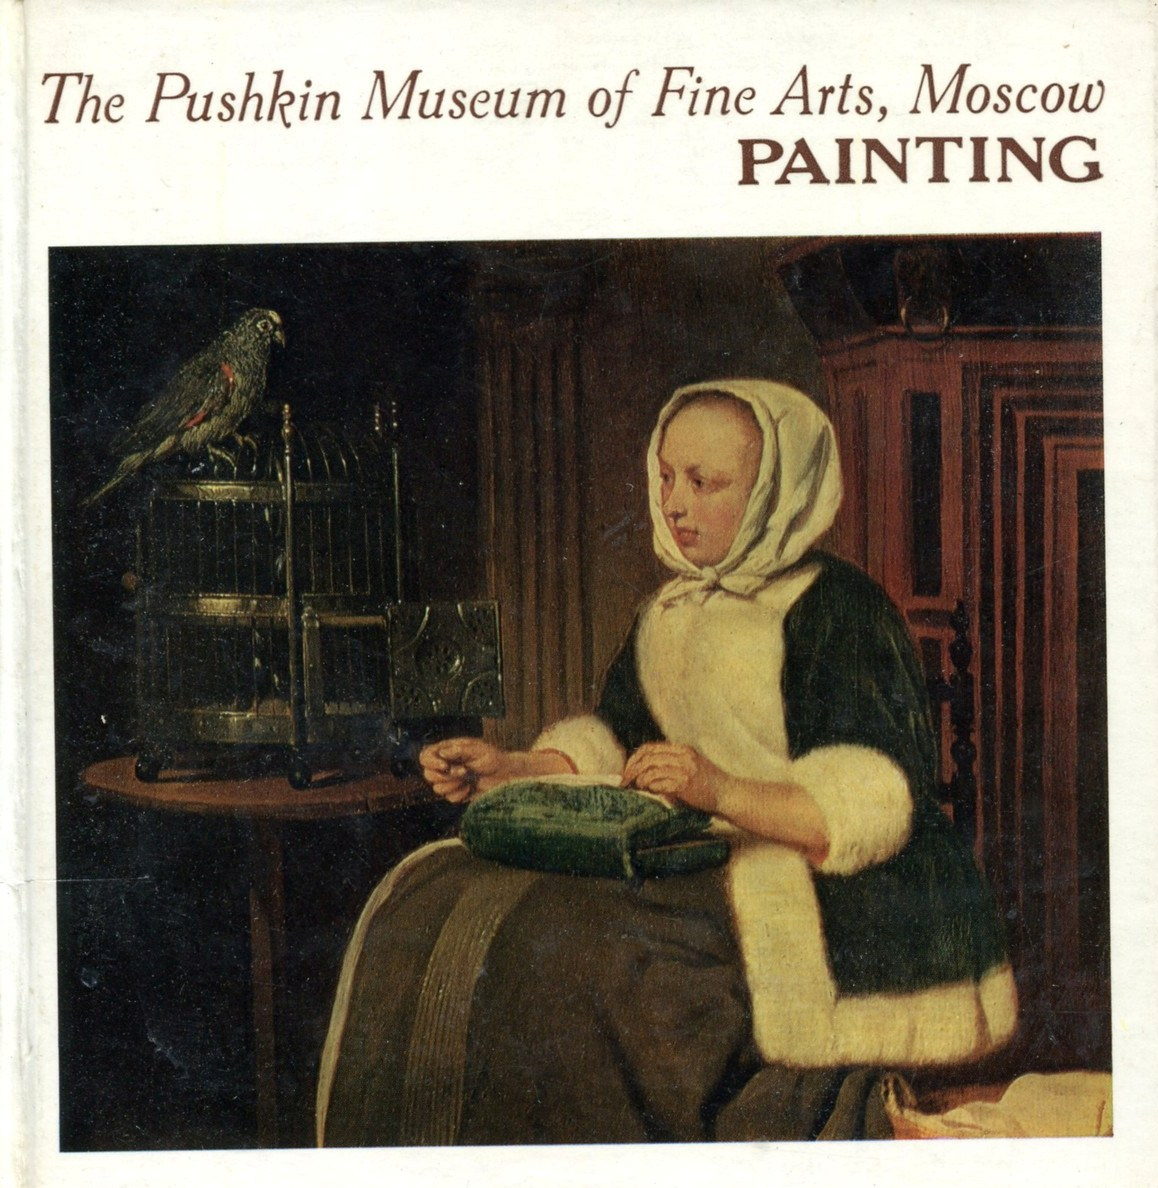 Антонова И.А. The Pushkin Museum of Fine Arts, Moscow. Painting. tatyana prilutskaya the pushkin museum of fine arts moscow painting